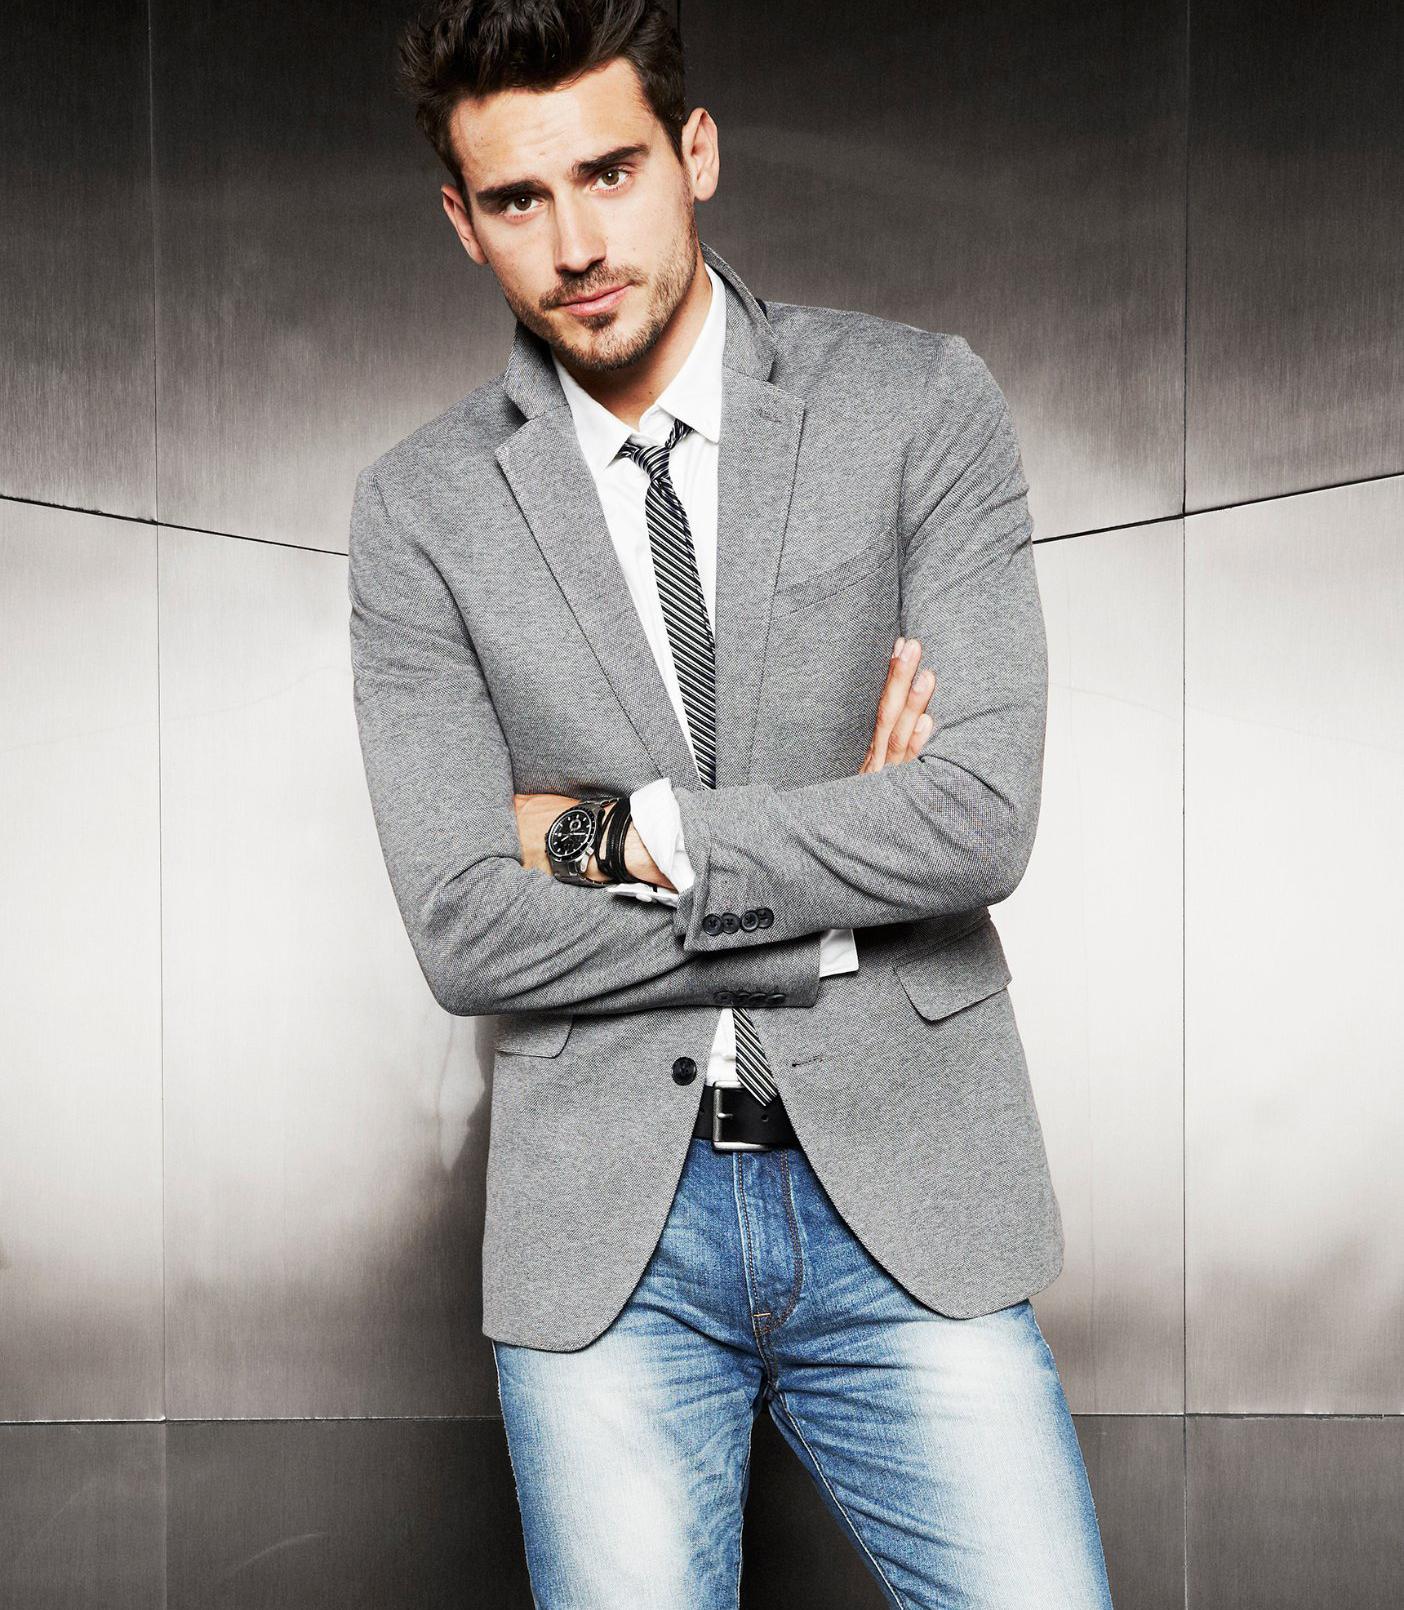 men casual business photo - 1